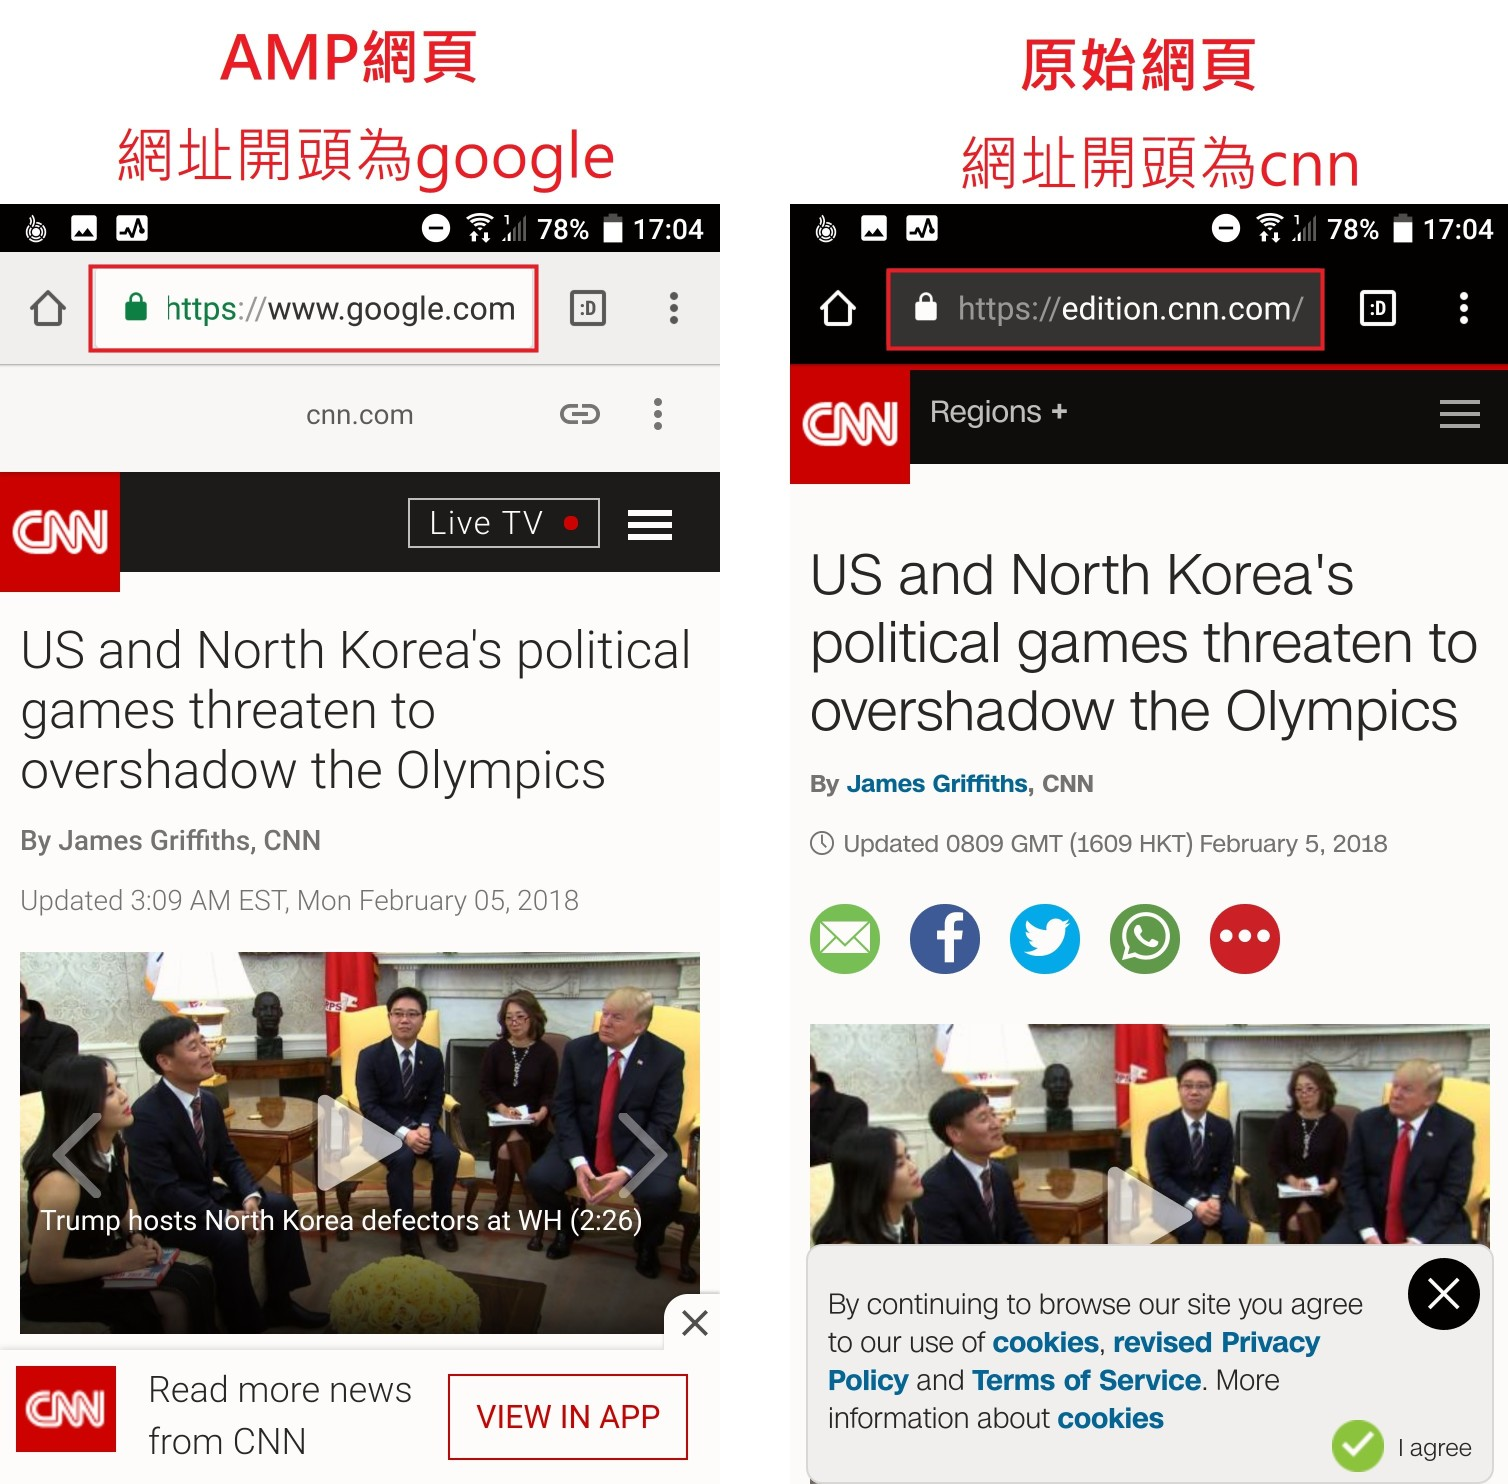 amp頁面及原始網頁的網址比較